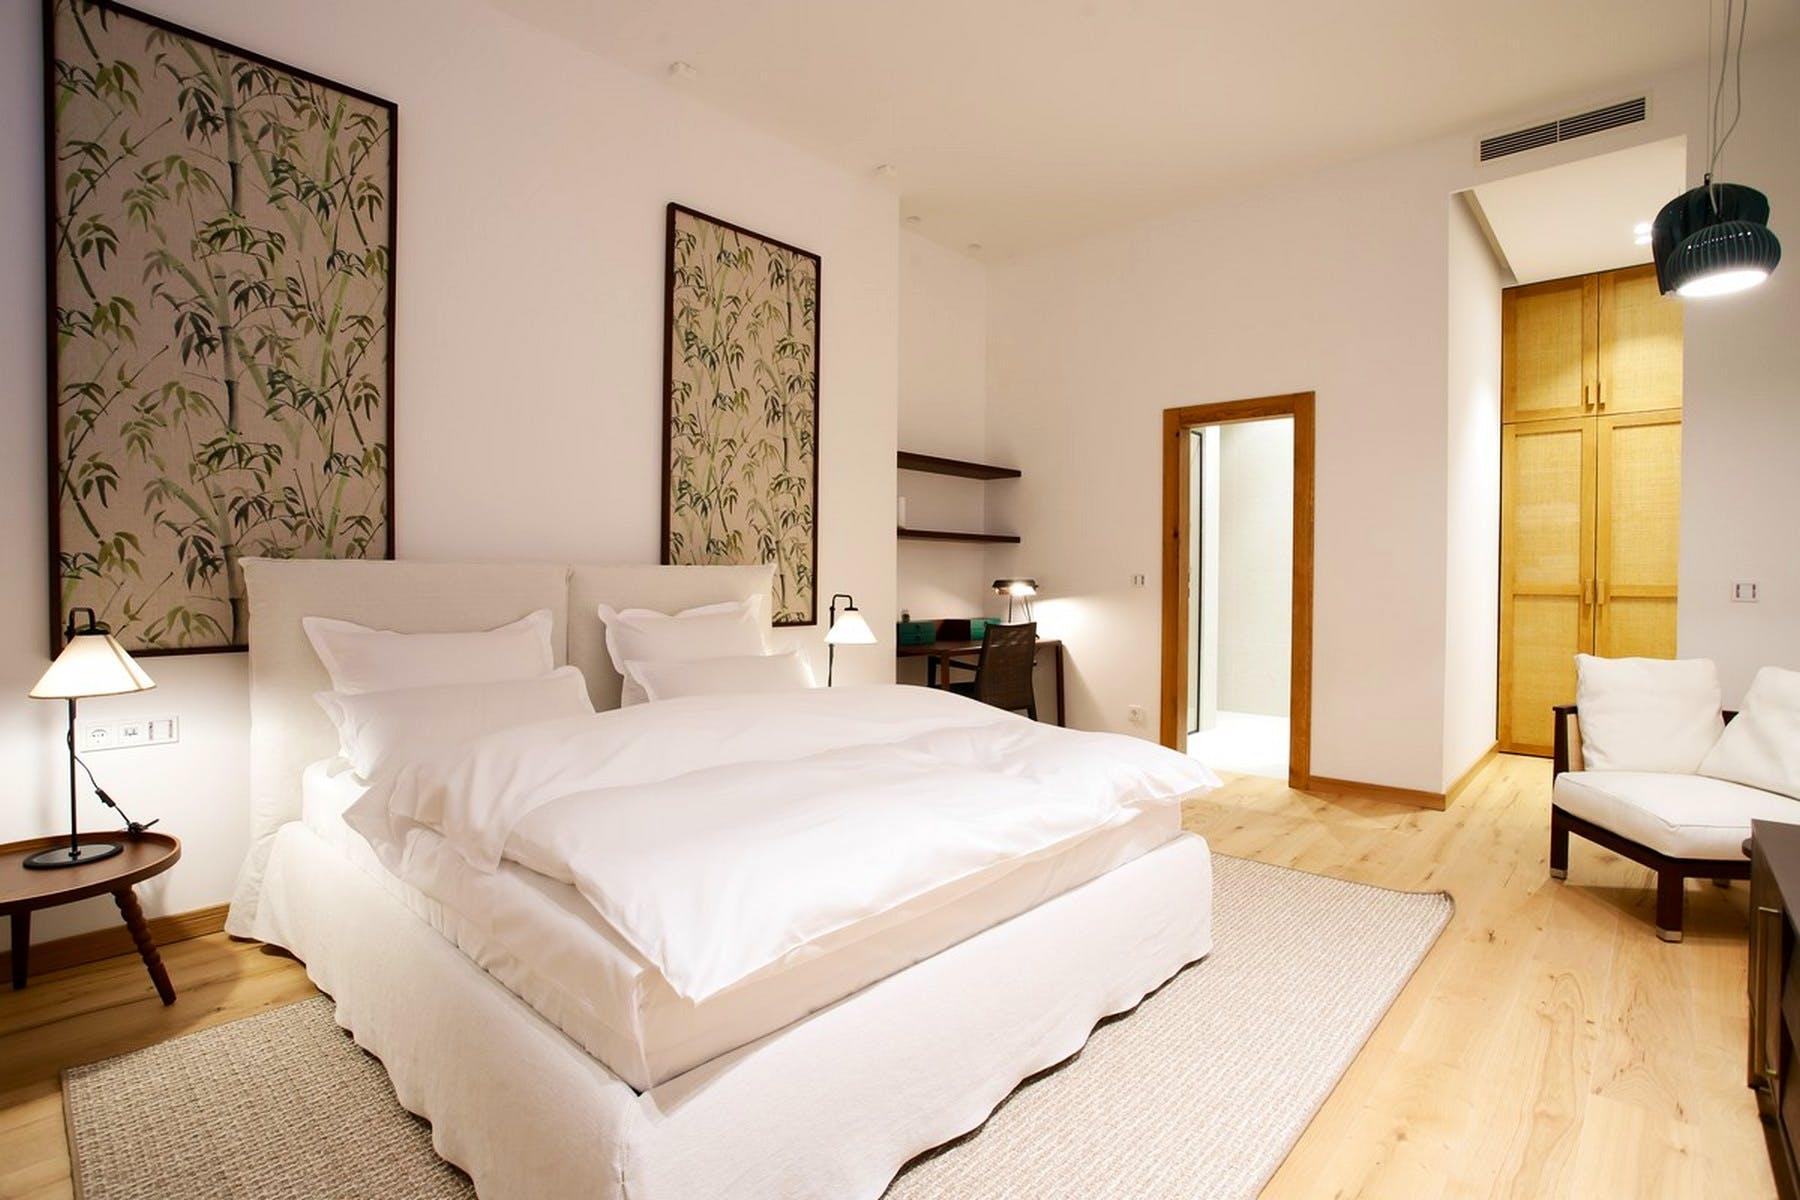 Spacious double bedroom